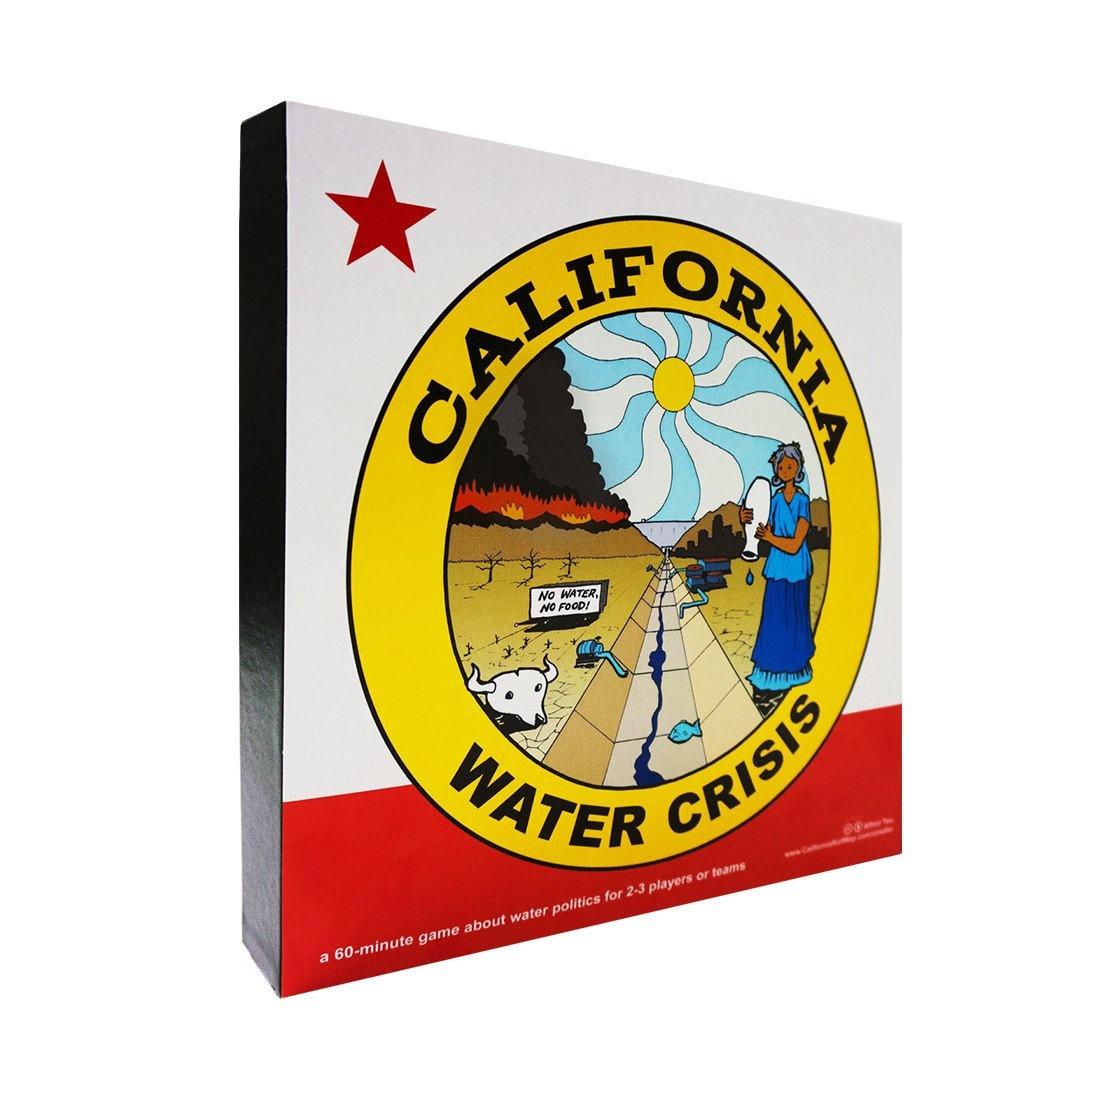 ALFRED TWU CALIFORNIA WATER CRISIS